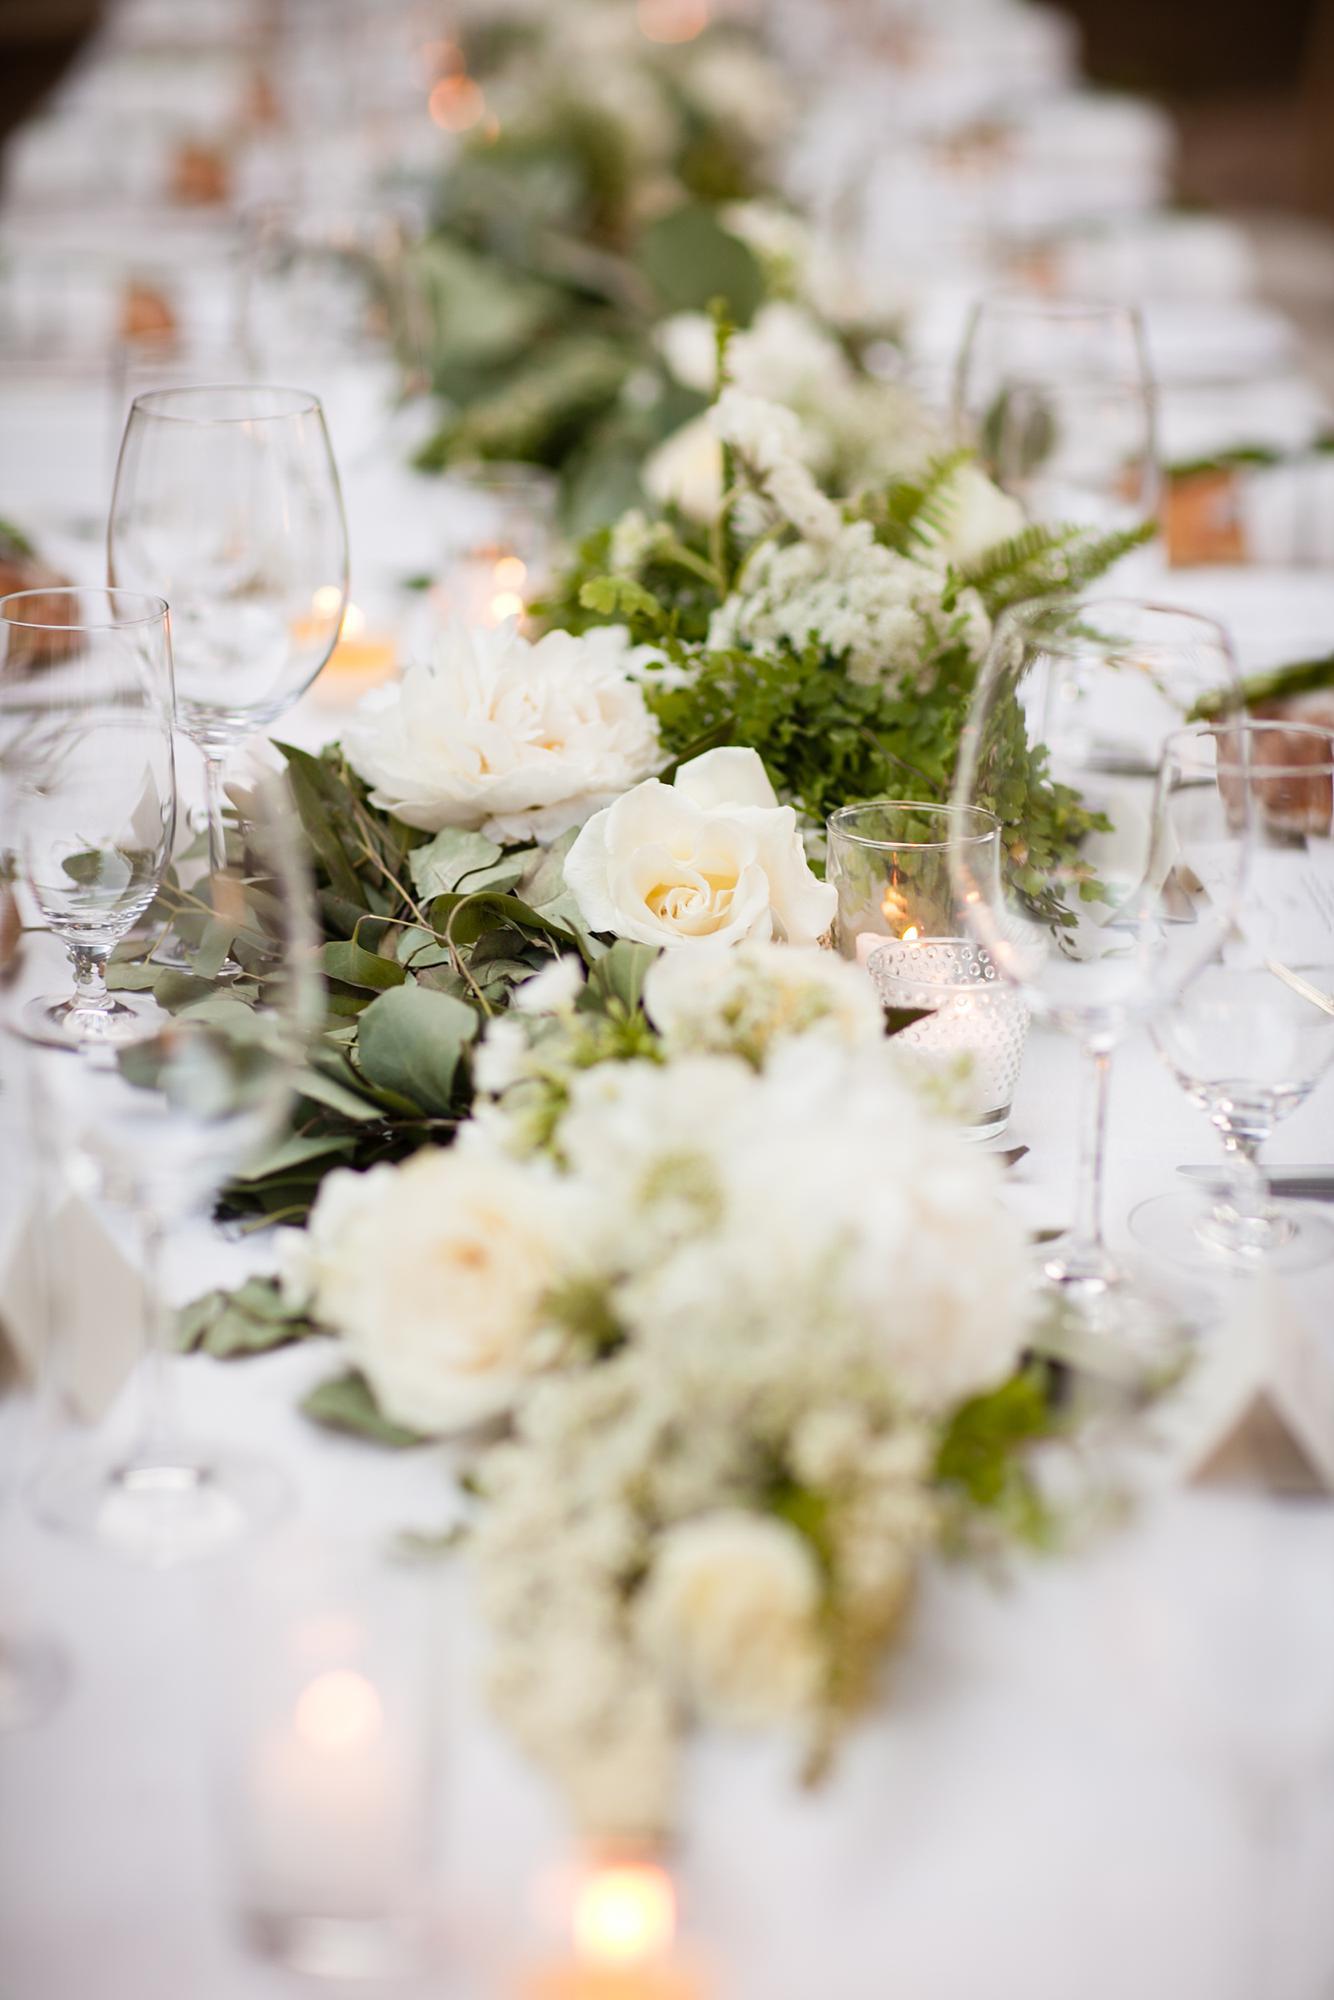 Firestone Winery Wedding | Miki & Sonja Photography | mikiandsonja.com